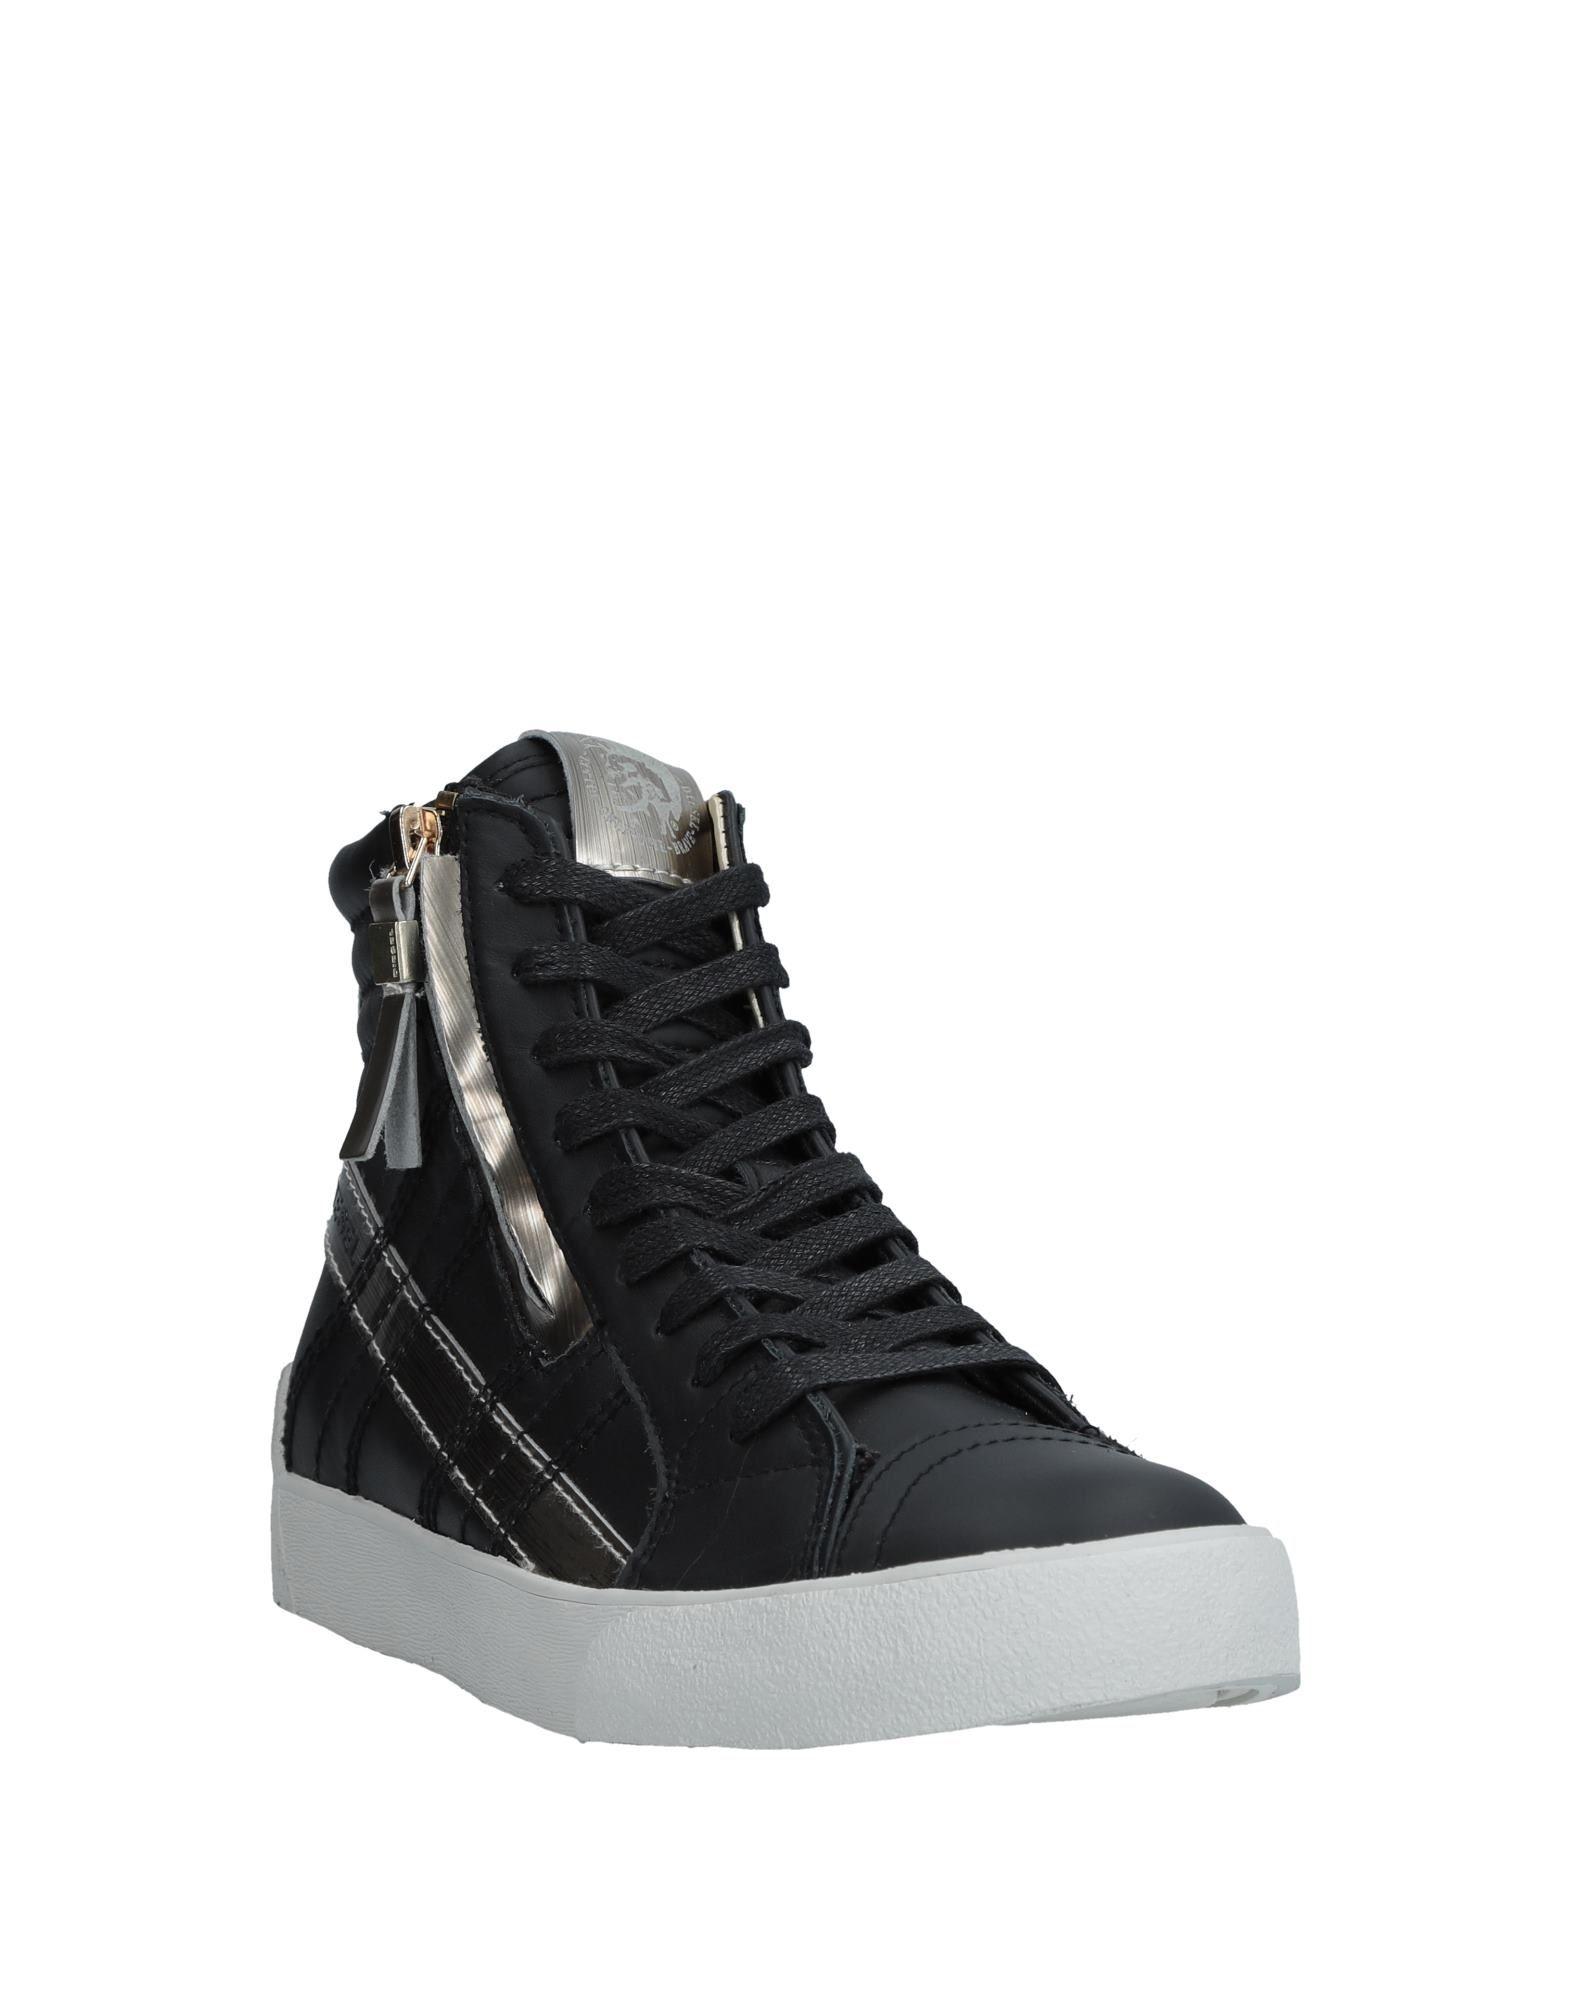 Diesel Sneakers Damen  Schuhe 11423684IE Gute Qualität beliebte Schuhe  90758f